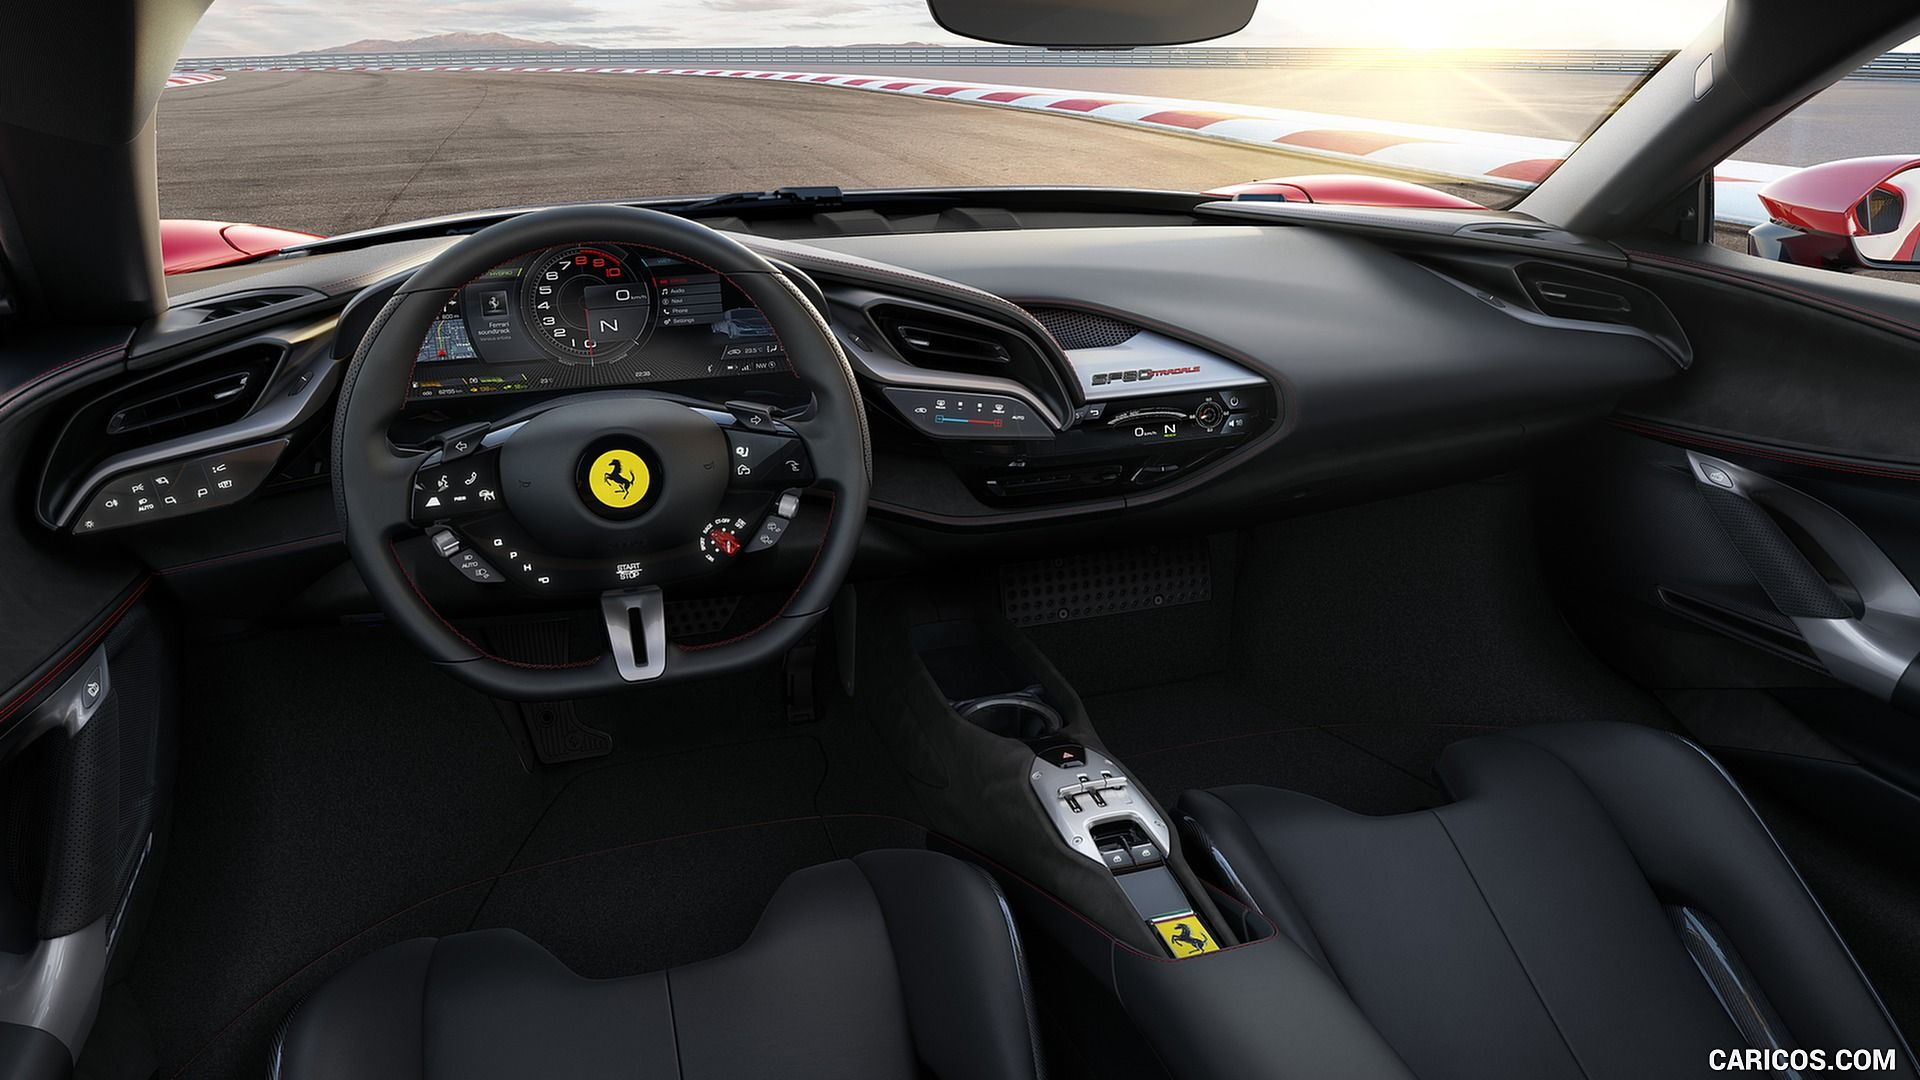 2020 Ferrari Sf90 Stradale Interior Cockpit Hd With Images